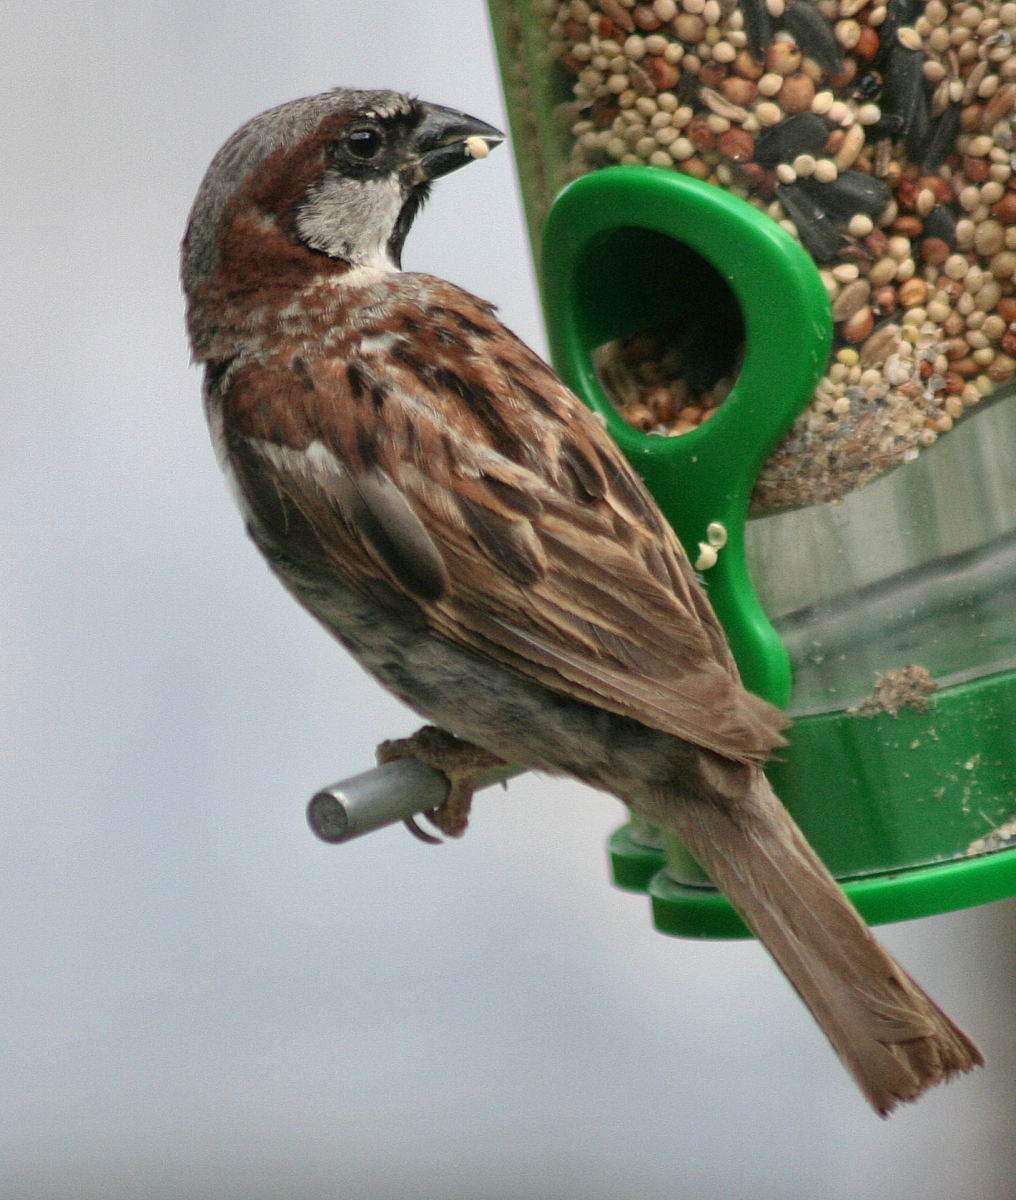 Bird Behaviour at Bird Feeders: Lesson Plan for Elementary Students